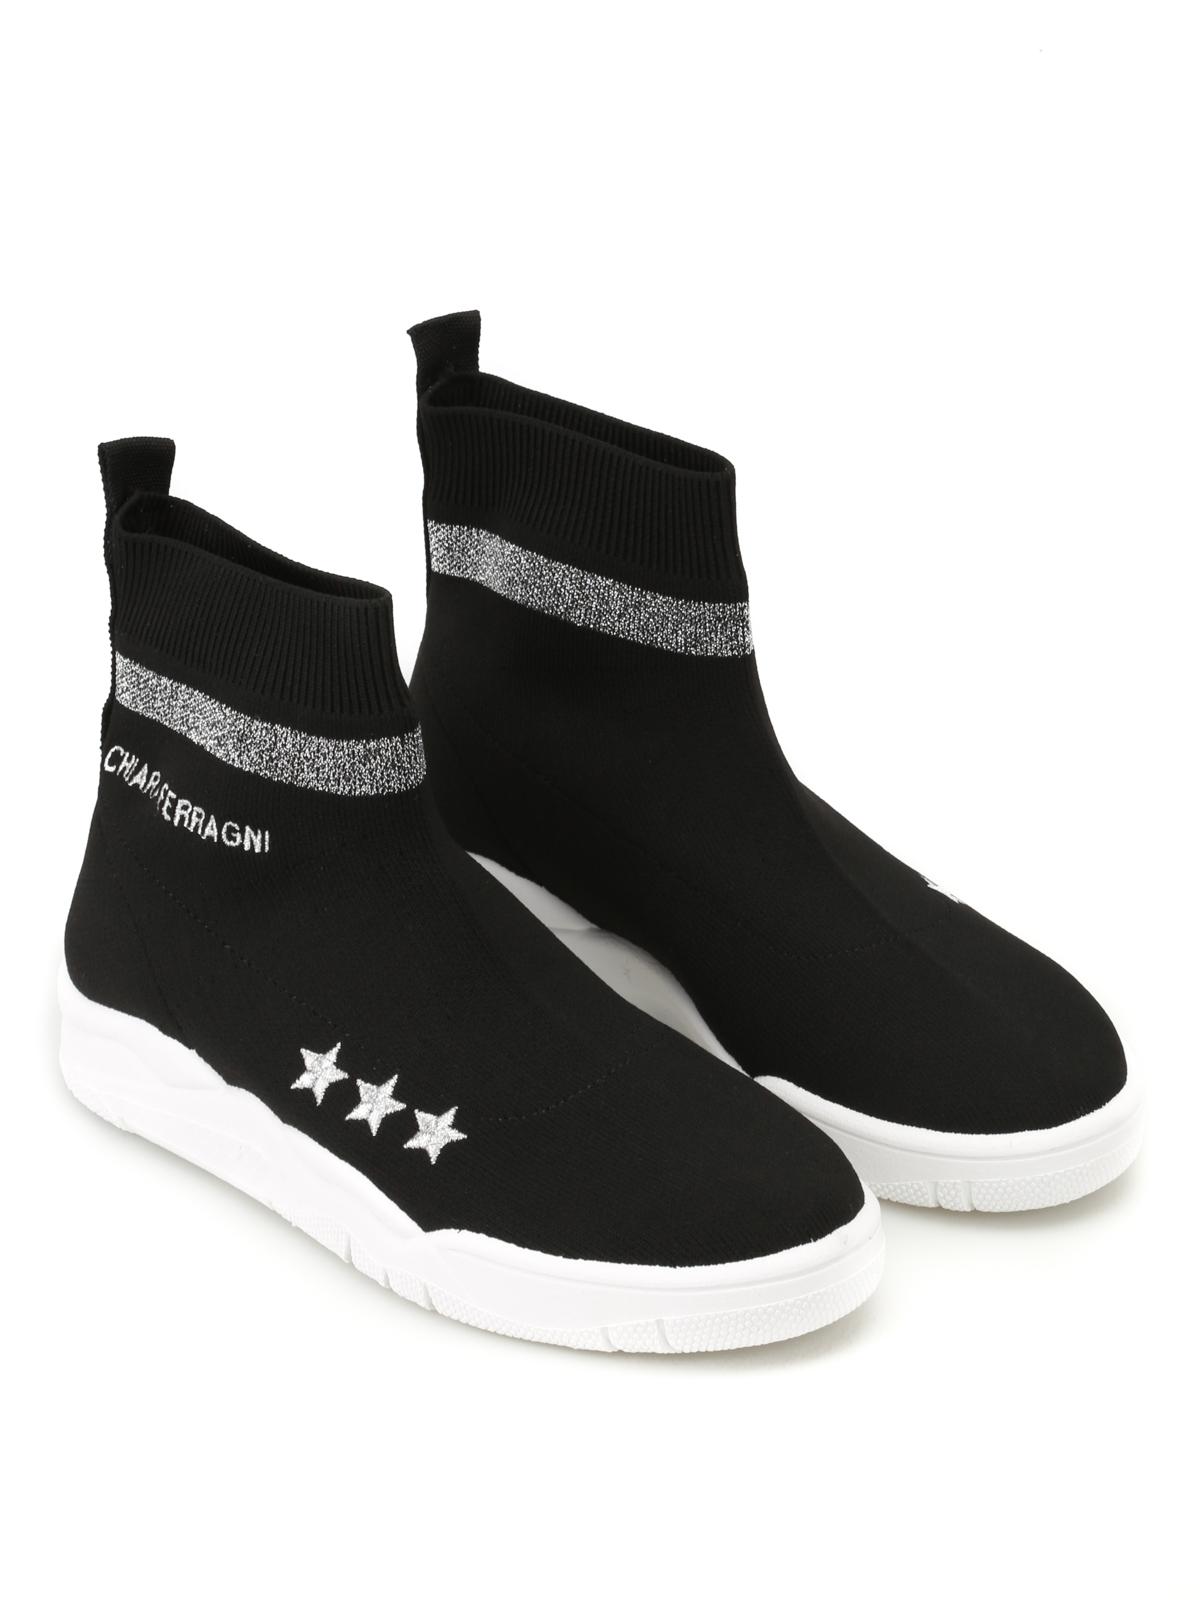 lurex socks sneakers Chiara Ferragni UgHBca5ZZr